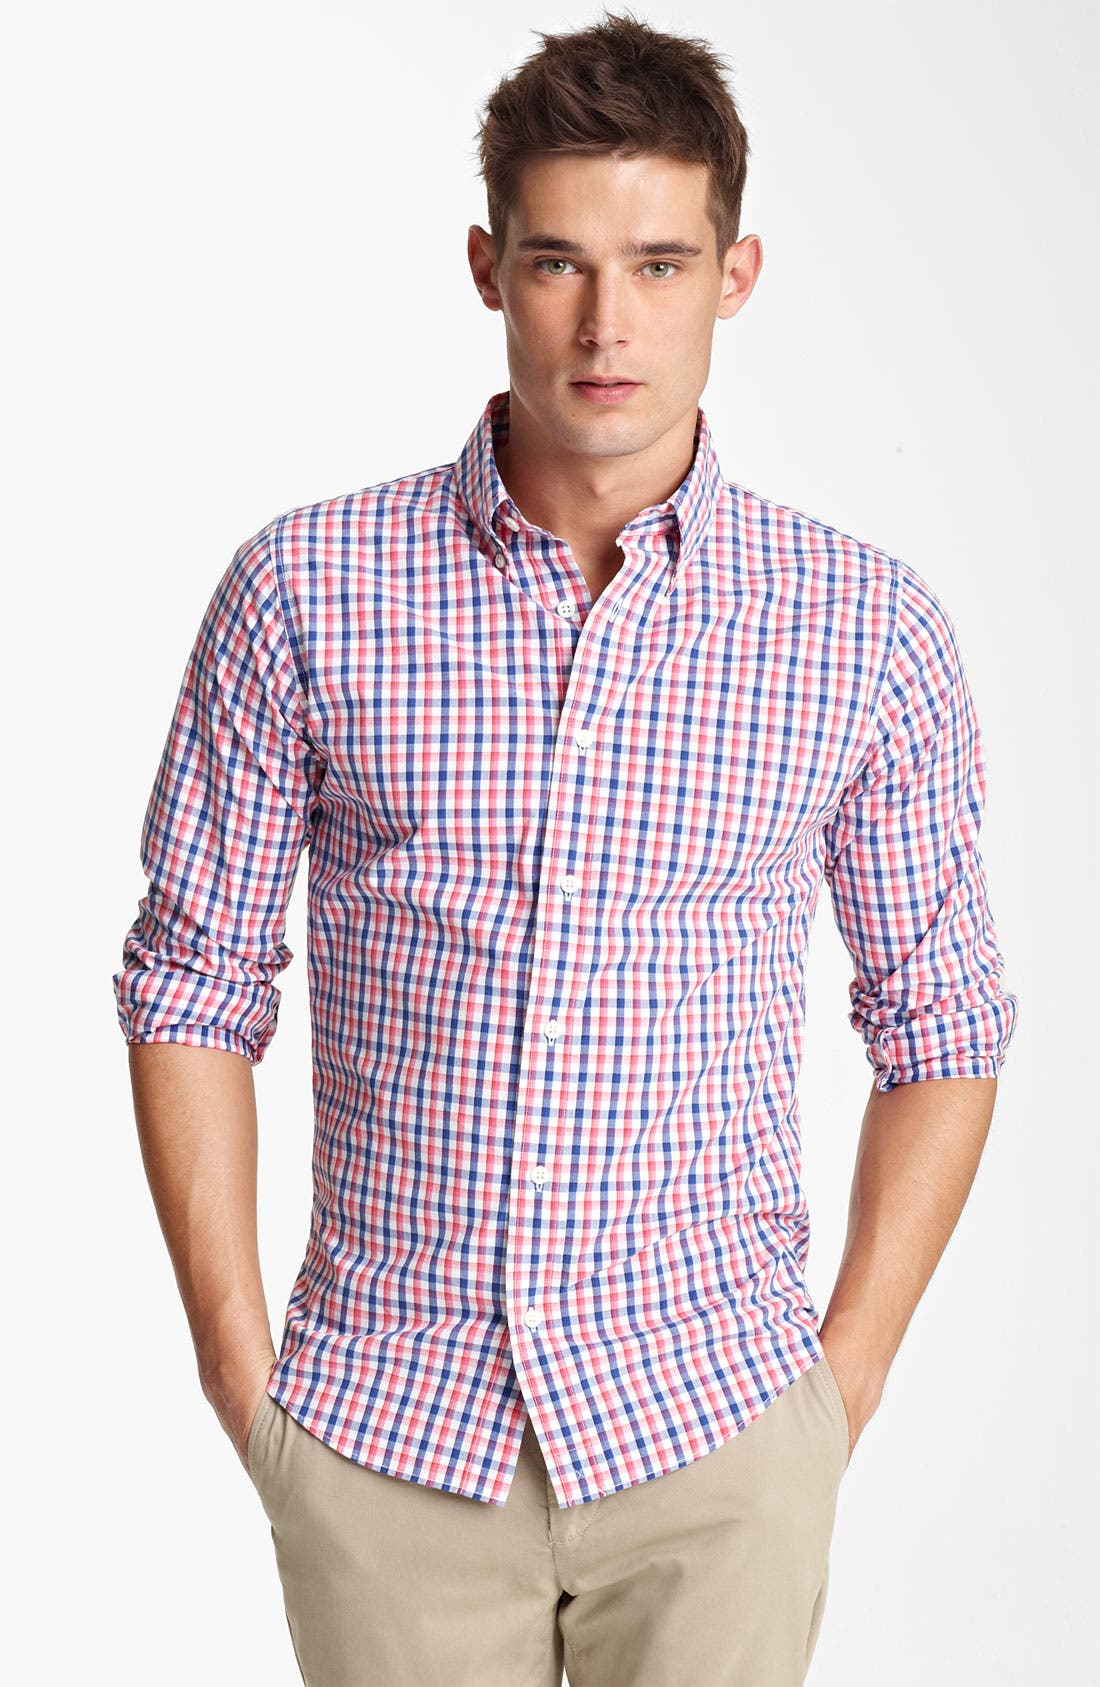 Alternate Image 1 Selected - Jack Spade 'Bailey' Gingham Check Shirt